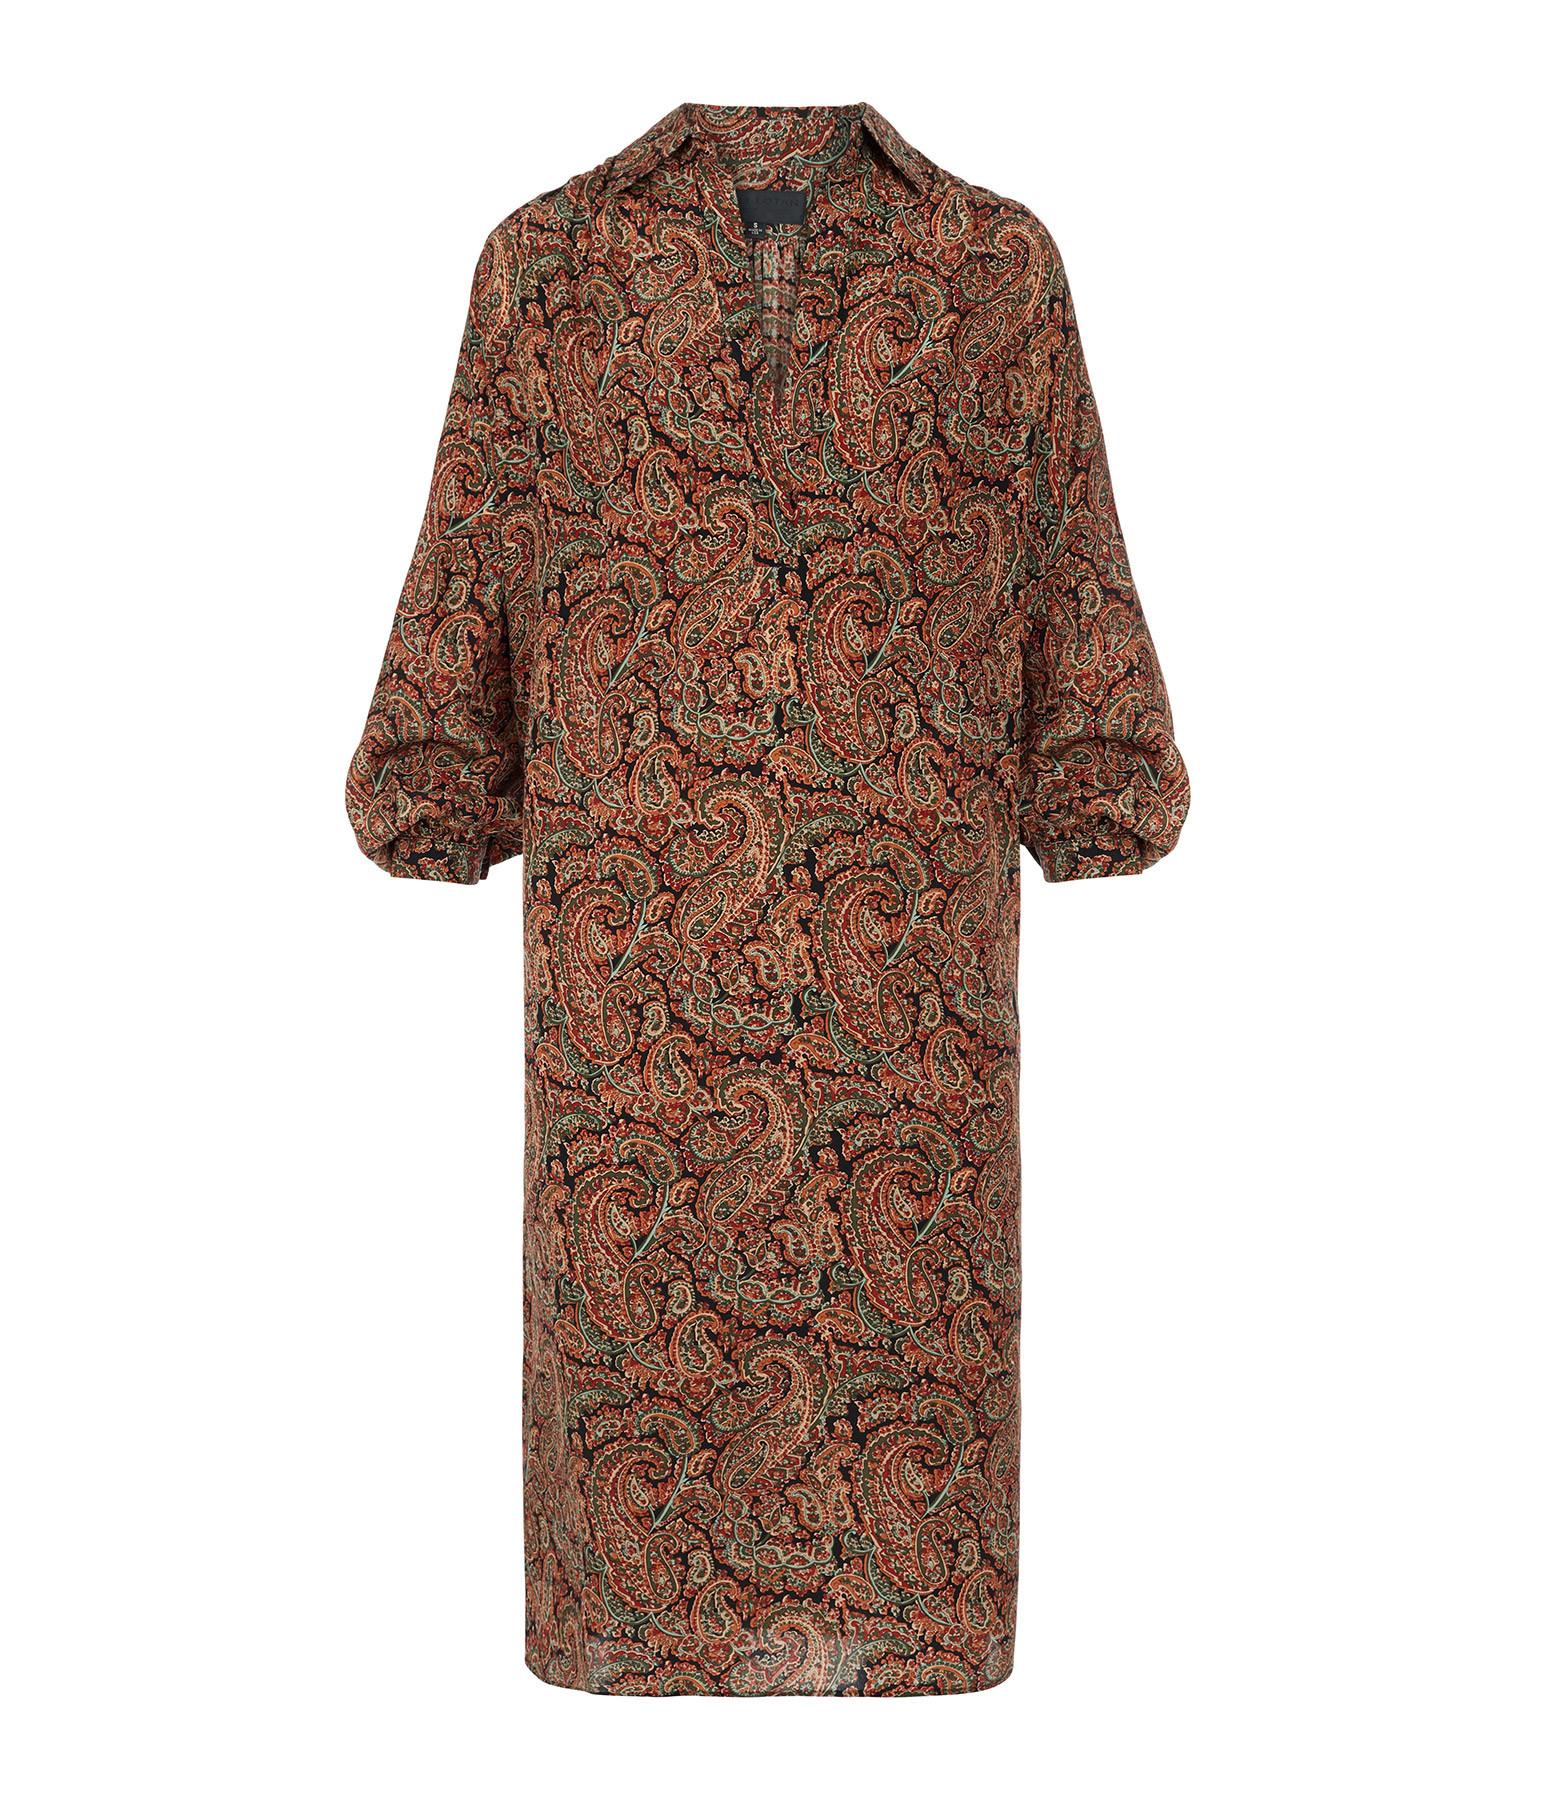 NILI LOTAN - Robe Kesia Imprimé Paisley